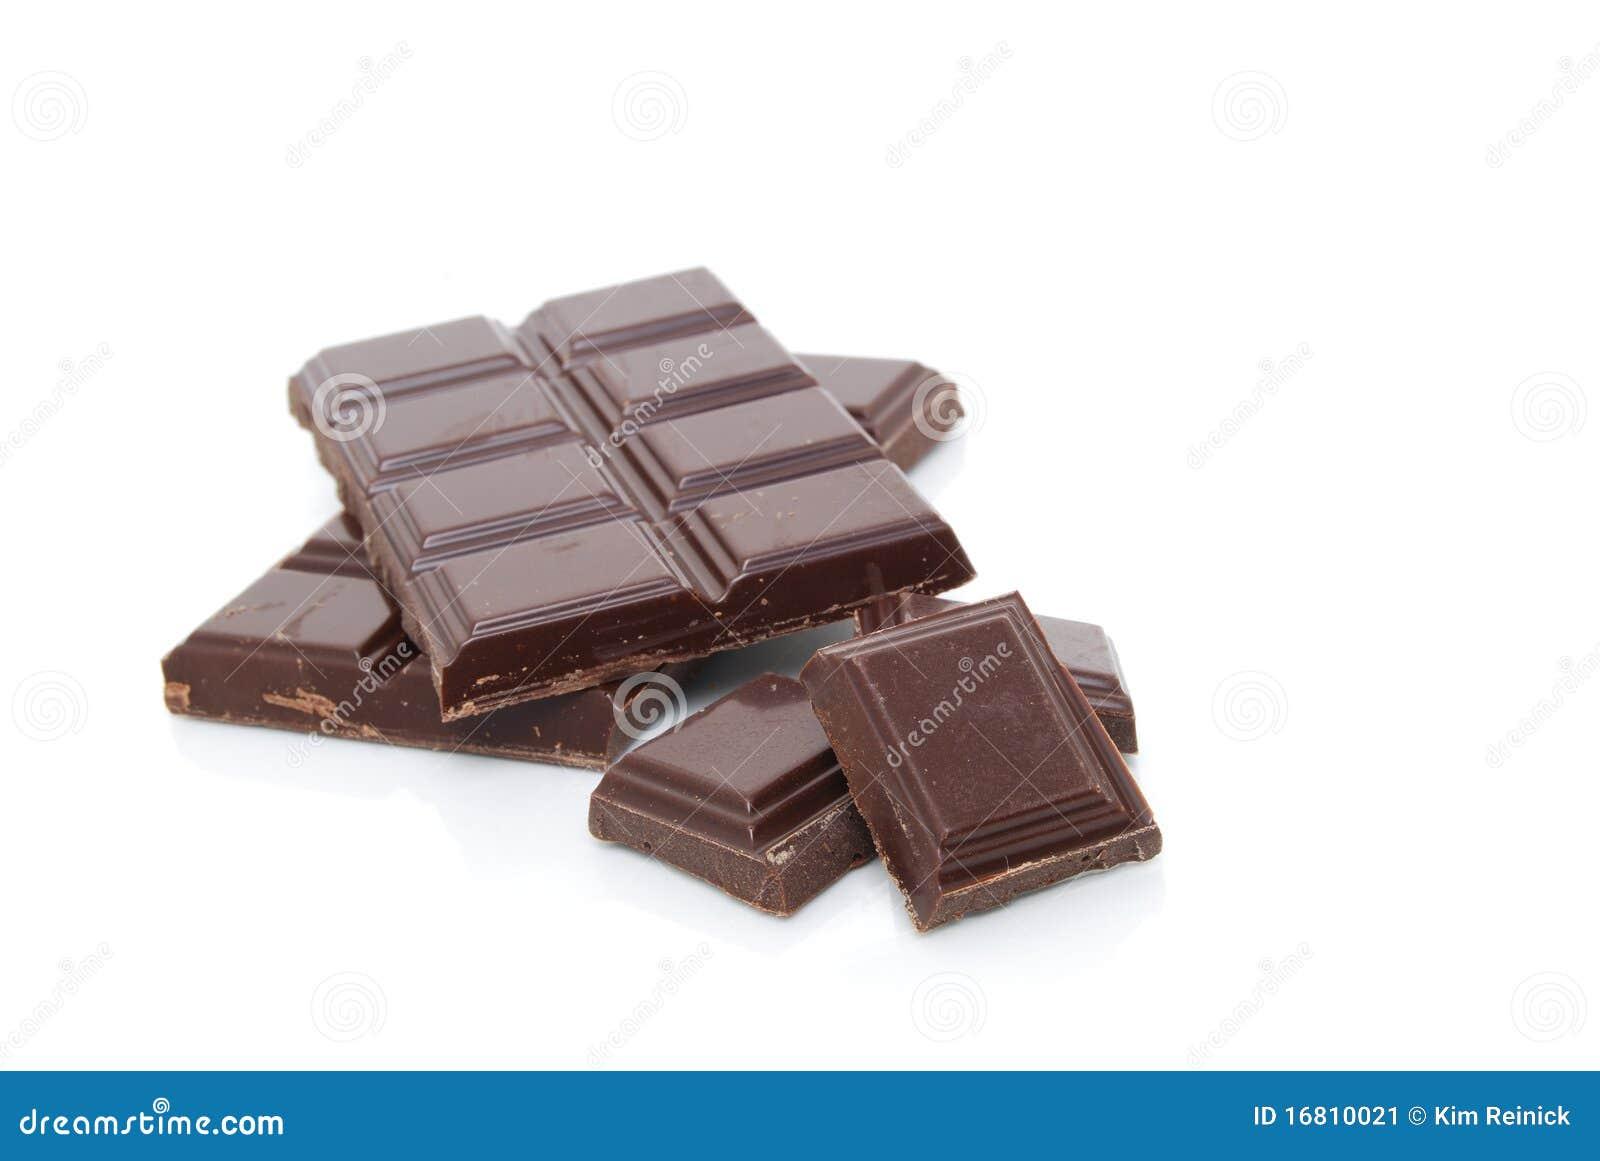 шоколад некоторые